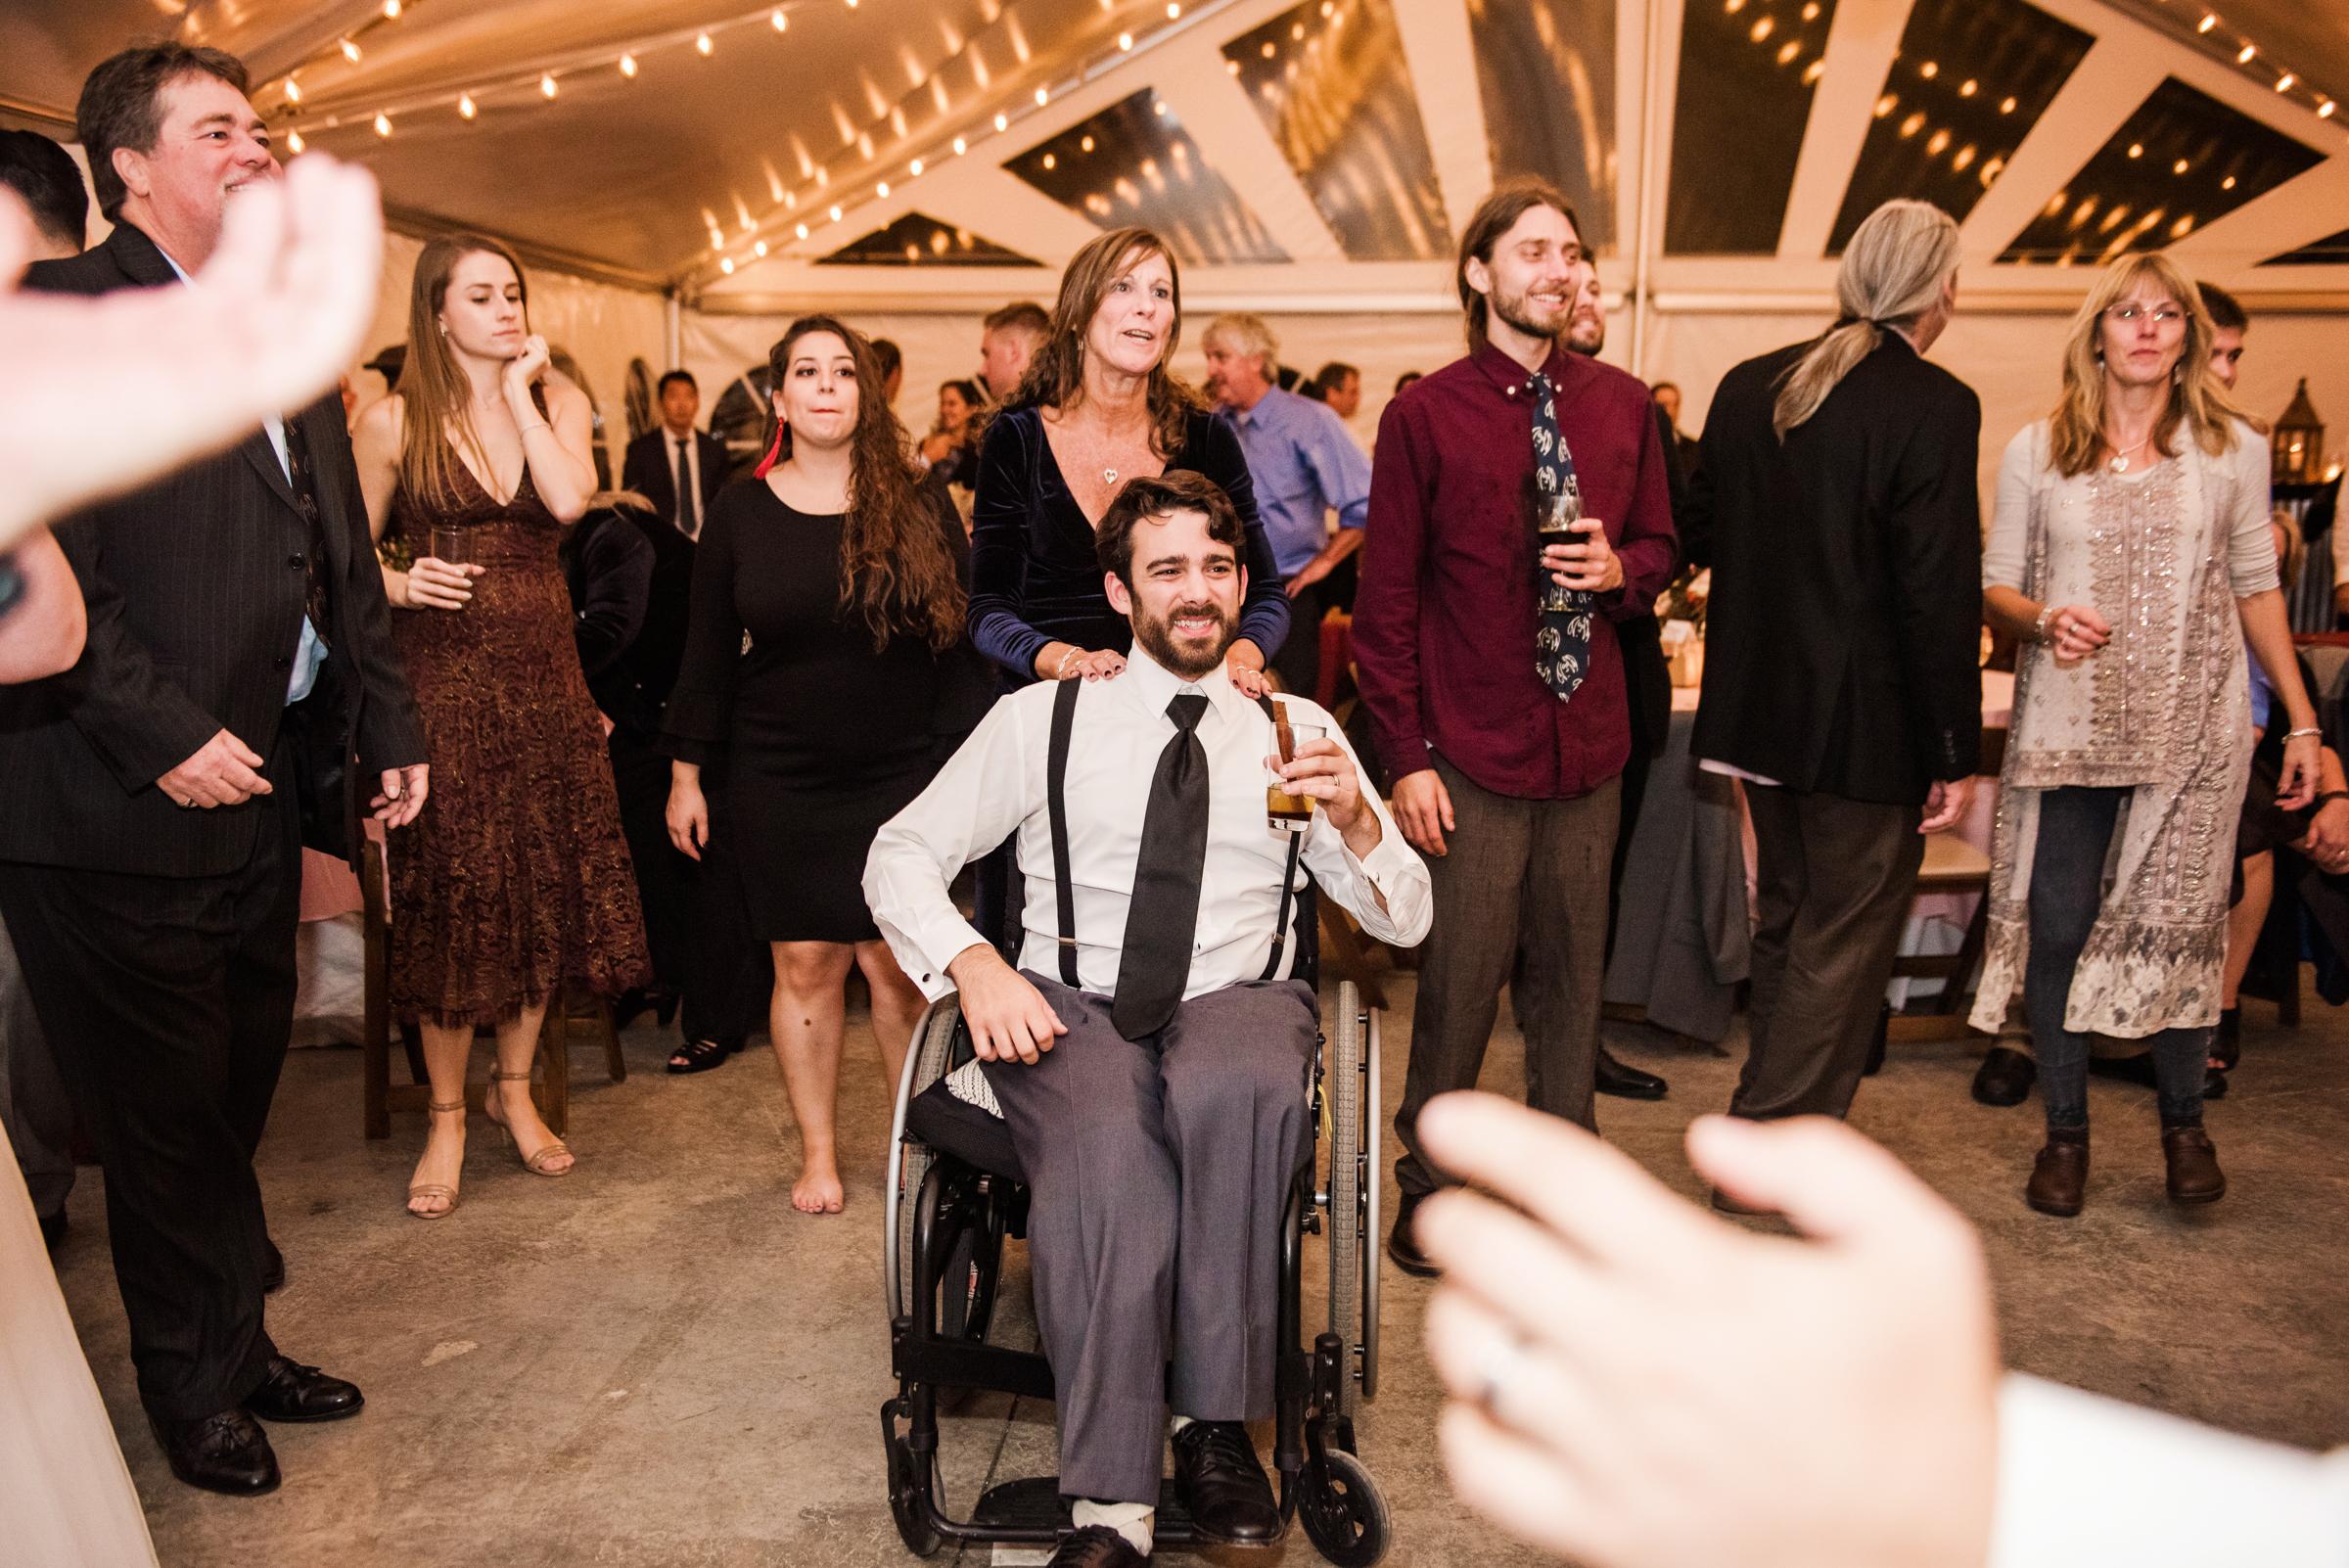 Zugibe_Vineyards_Finger_Lakes_Wedding_JILL_STUDIO_Rochester_NY_Photographer_DSC_4544.jpg